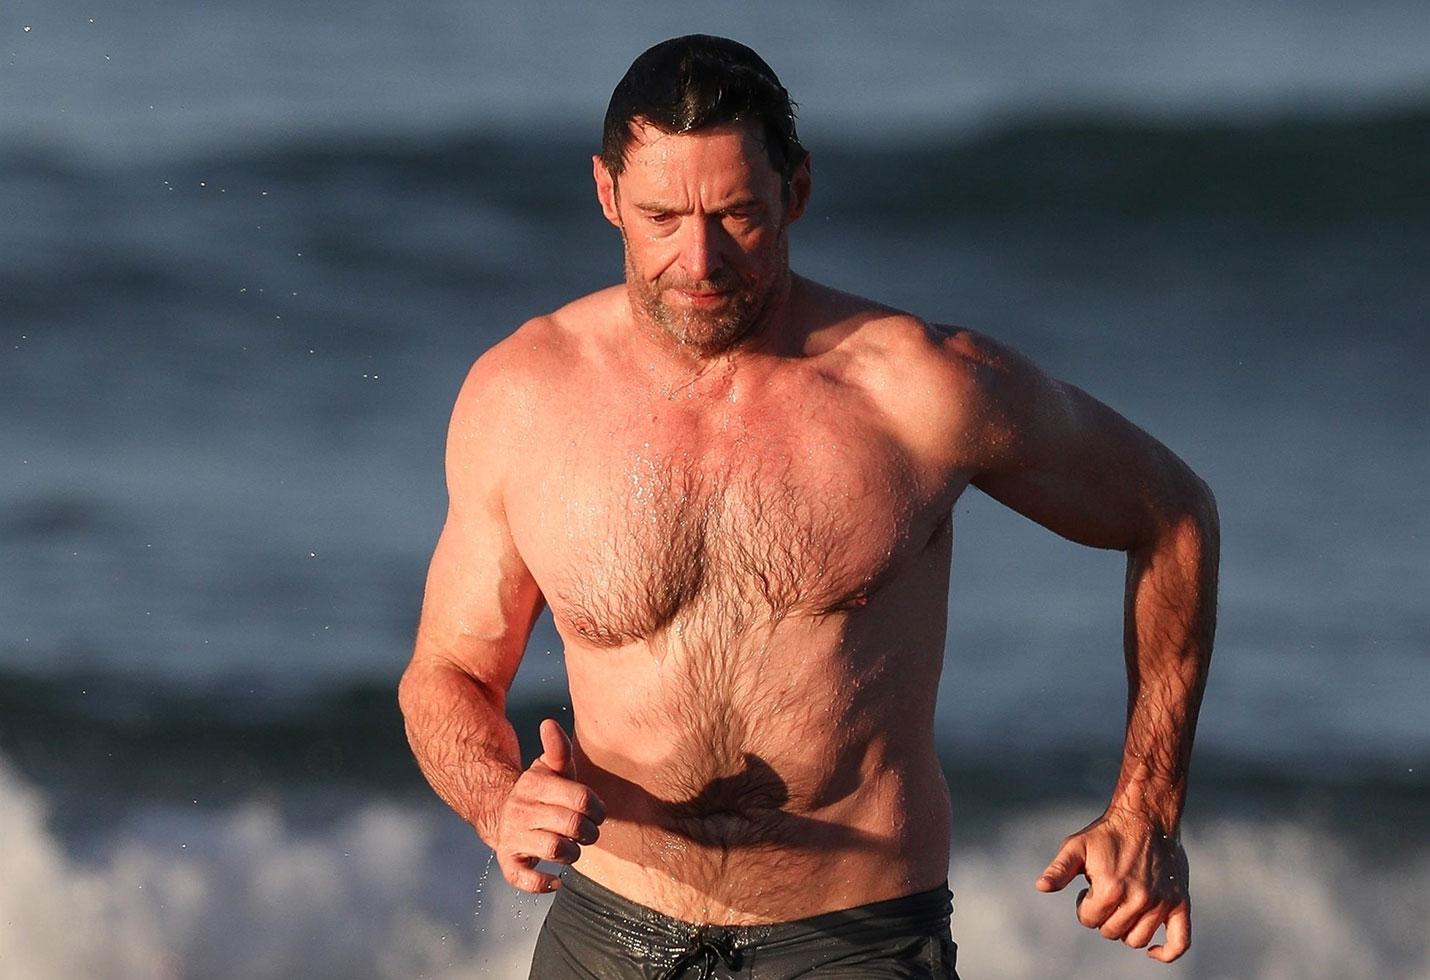 Hugh jackman shirtless abs beach body